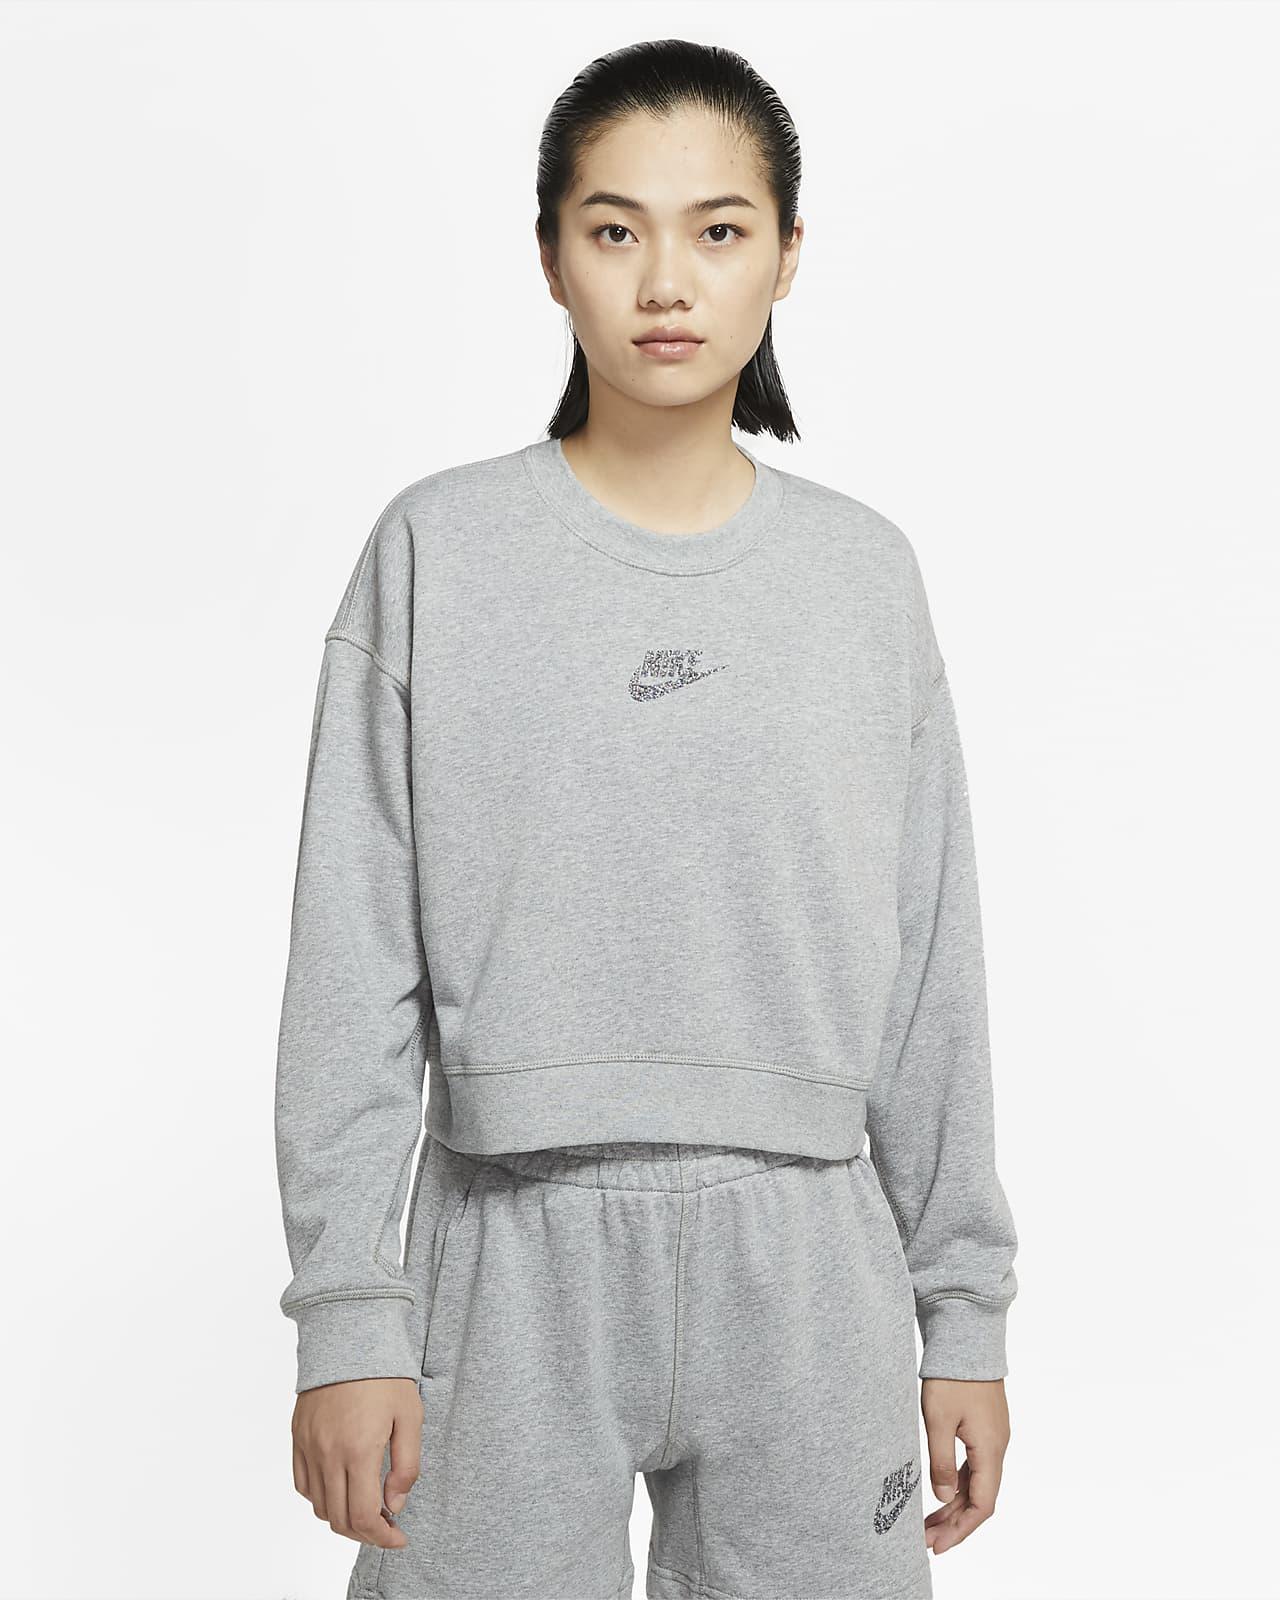 huella entrevista Sucio  Sudadera para mujer Nike Sportswear. Nike.com